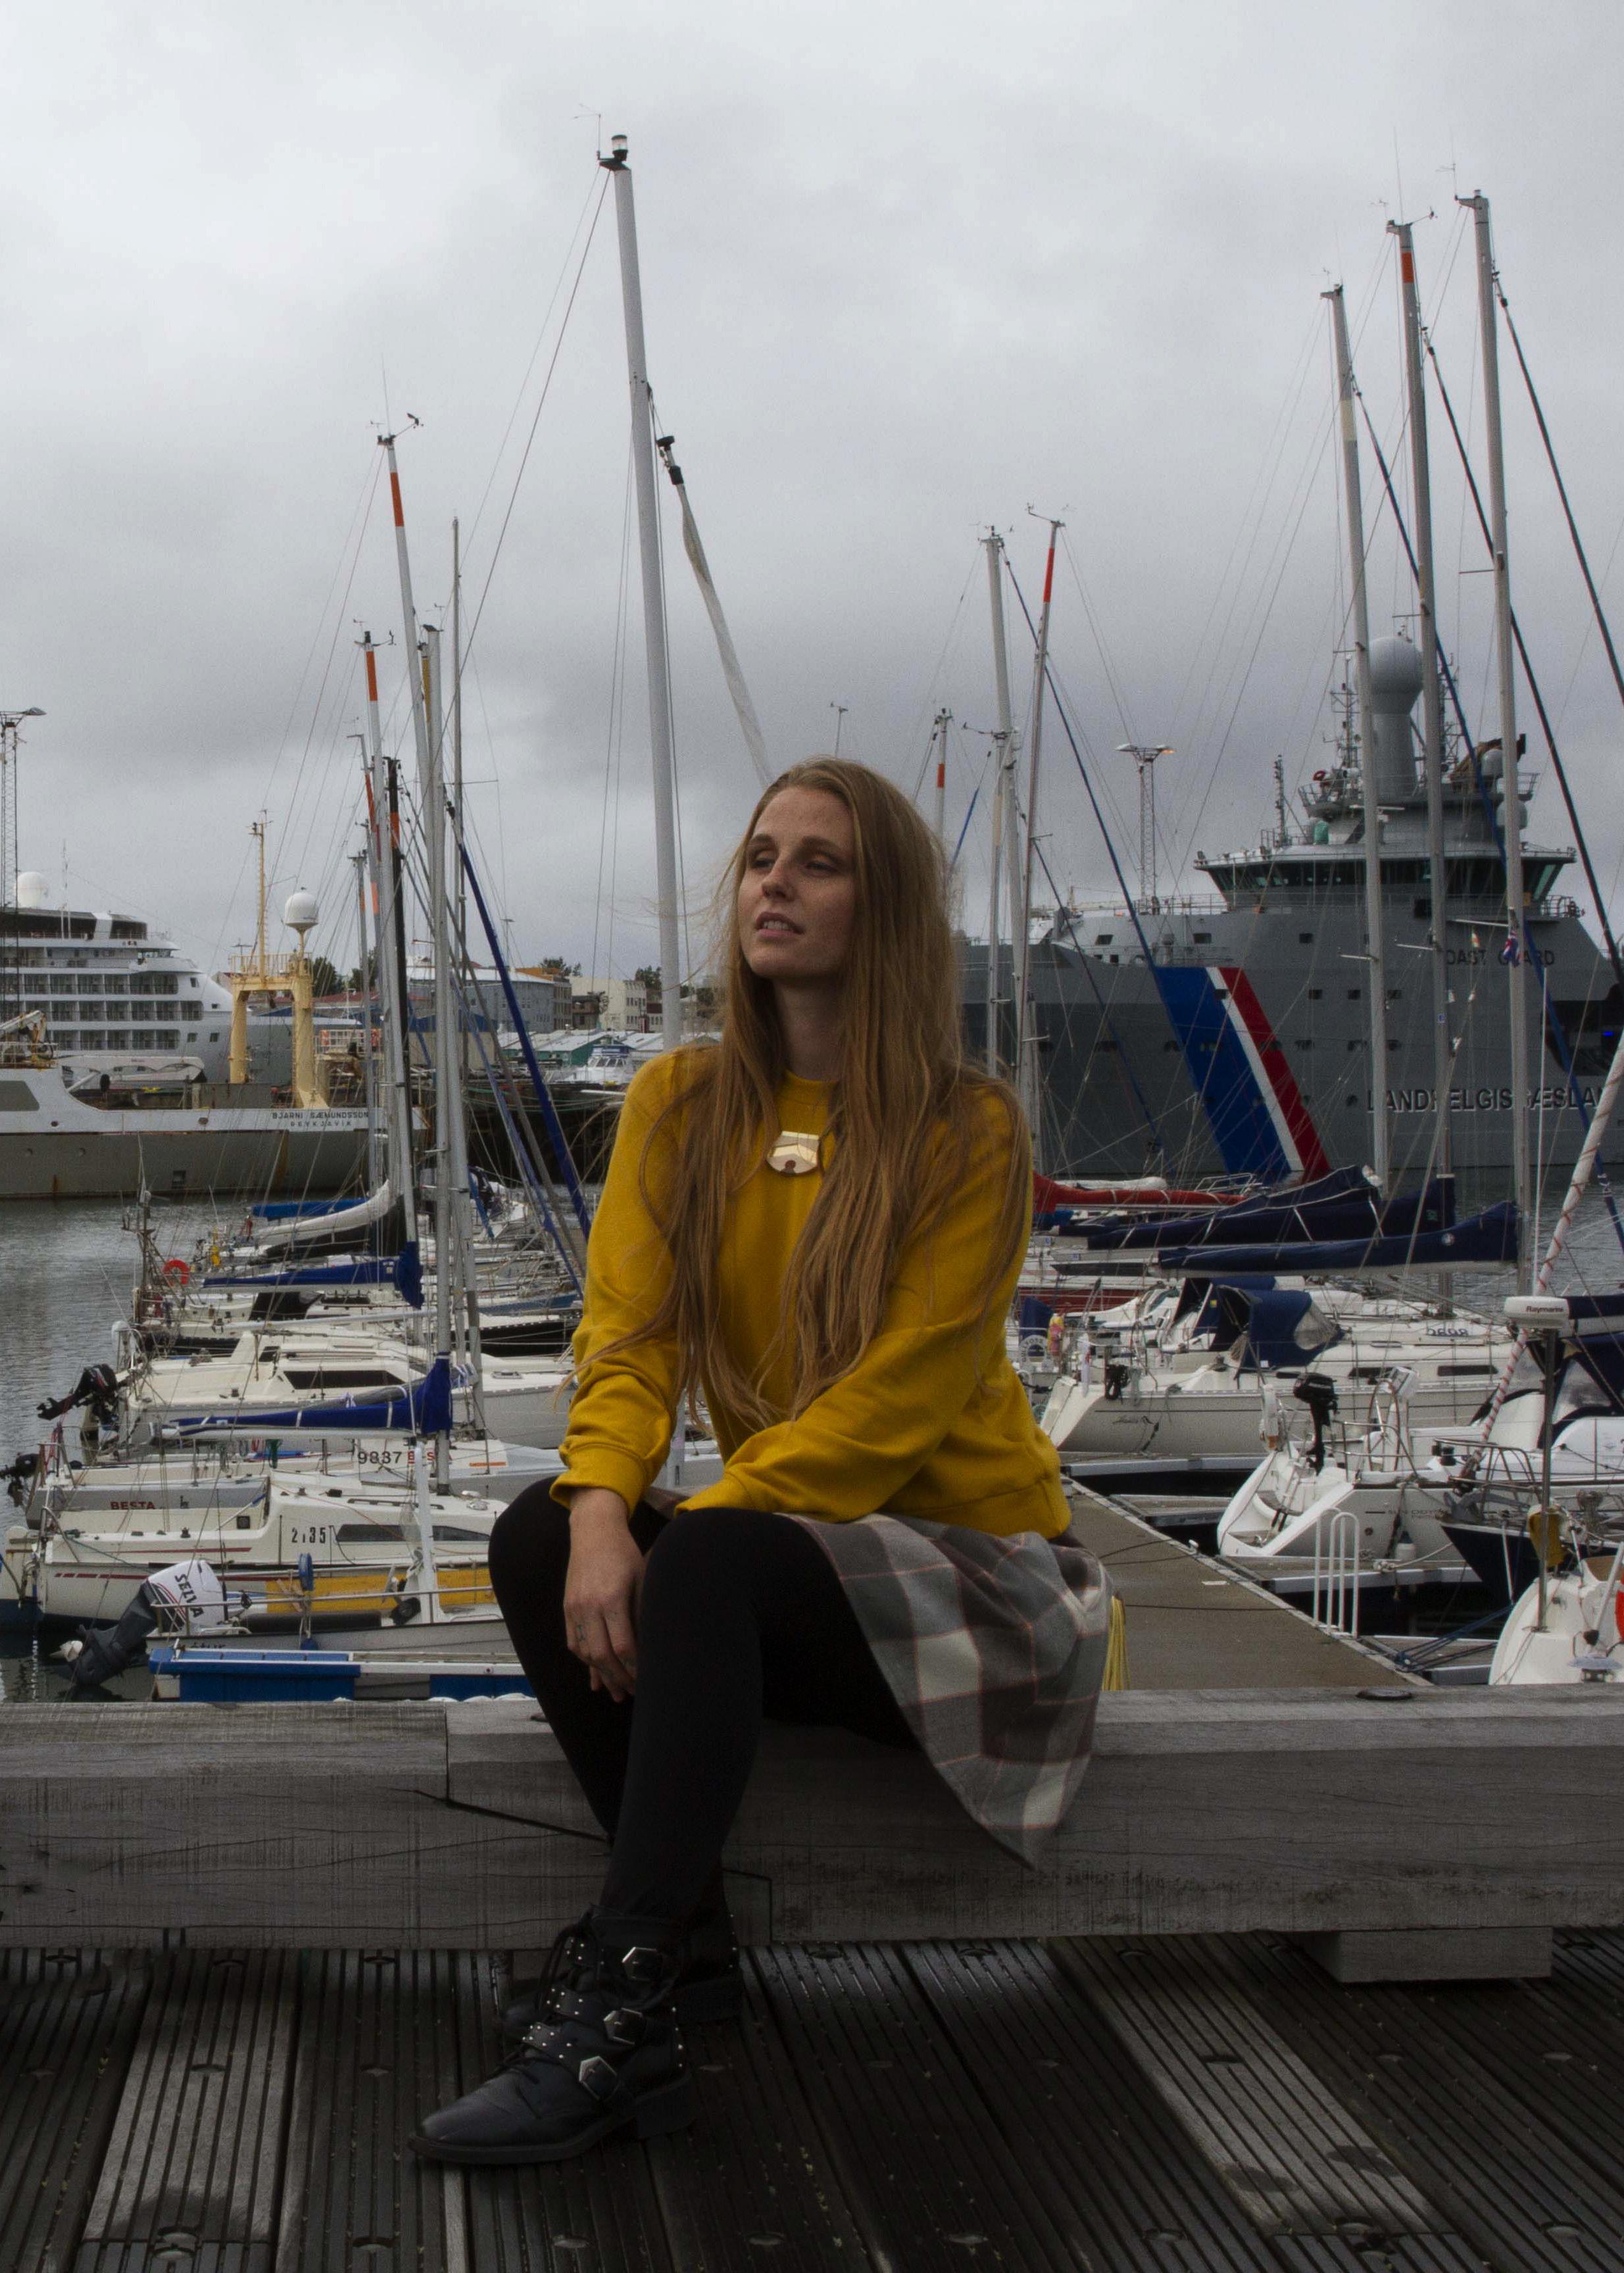 Runa sweatshirt, Katrin skirt